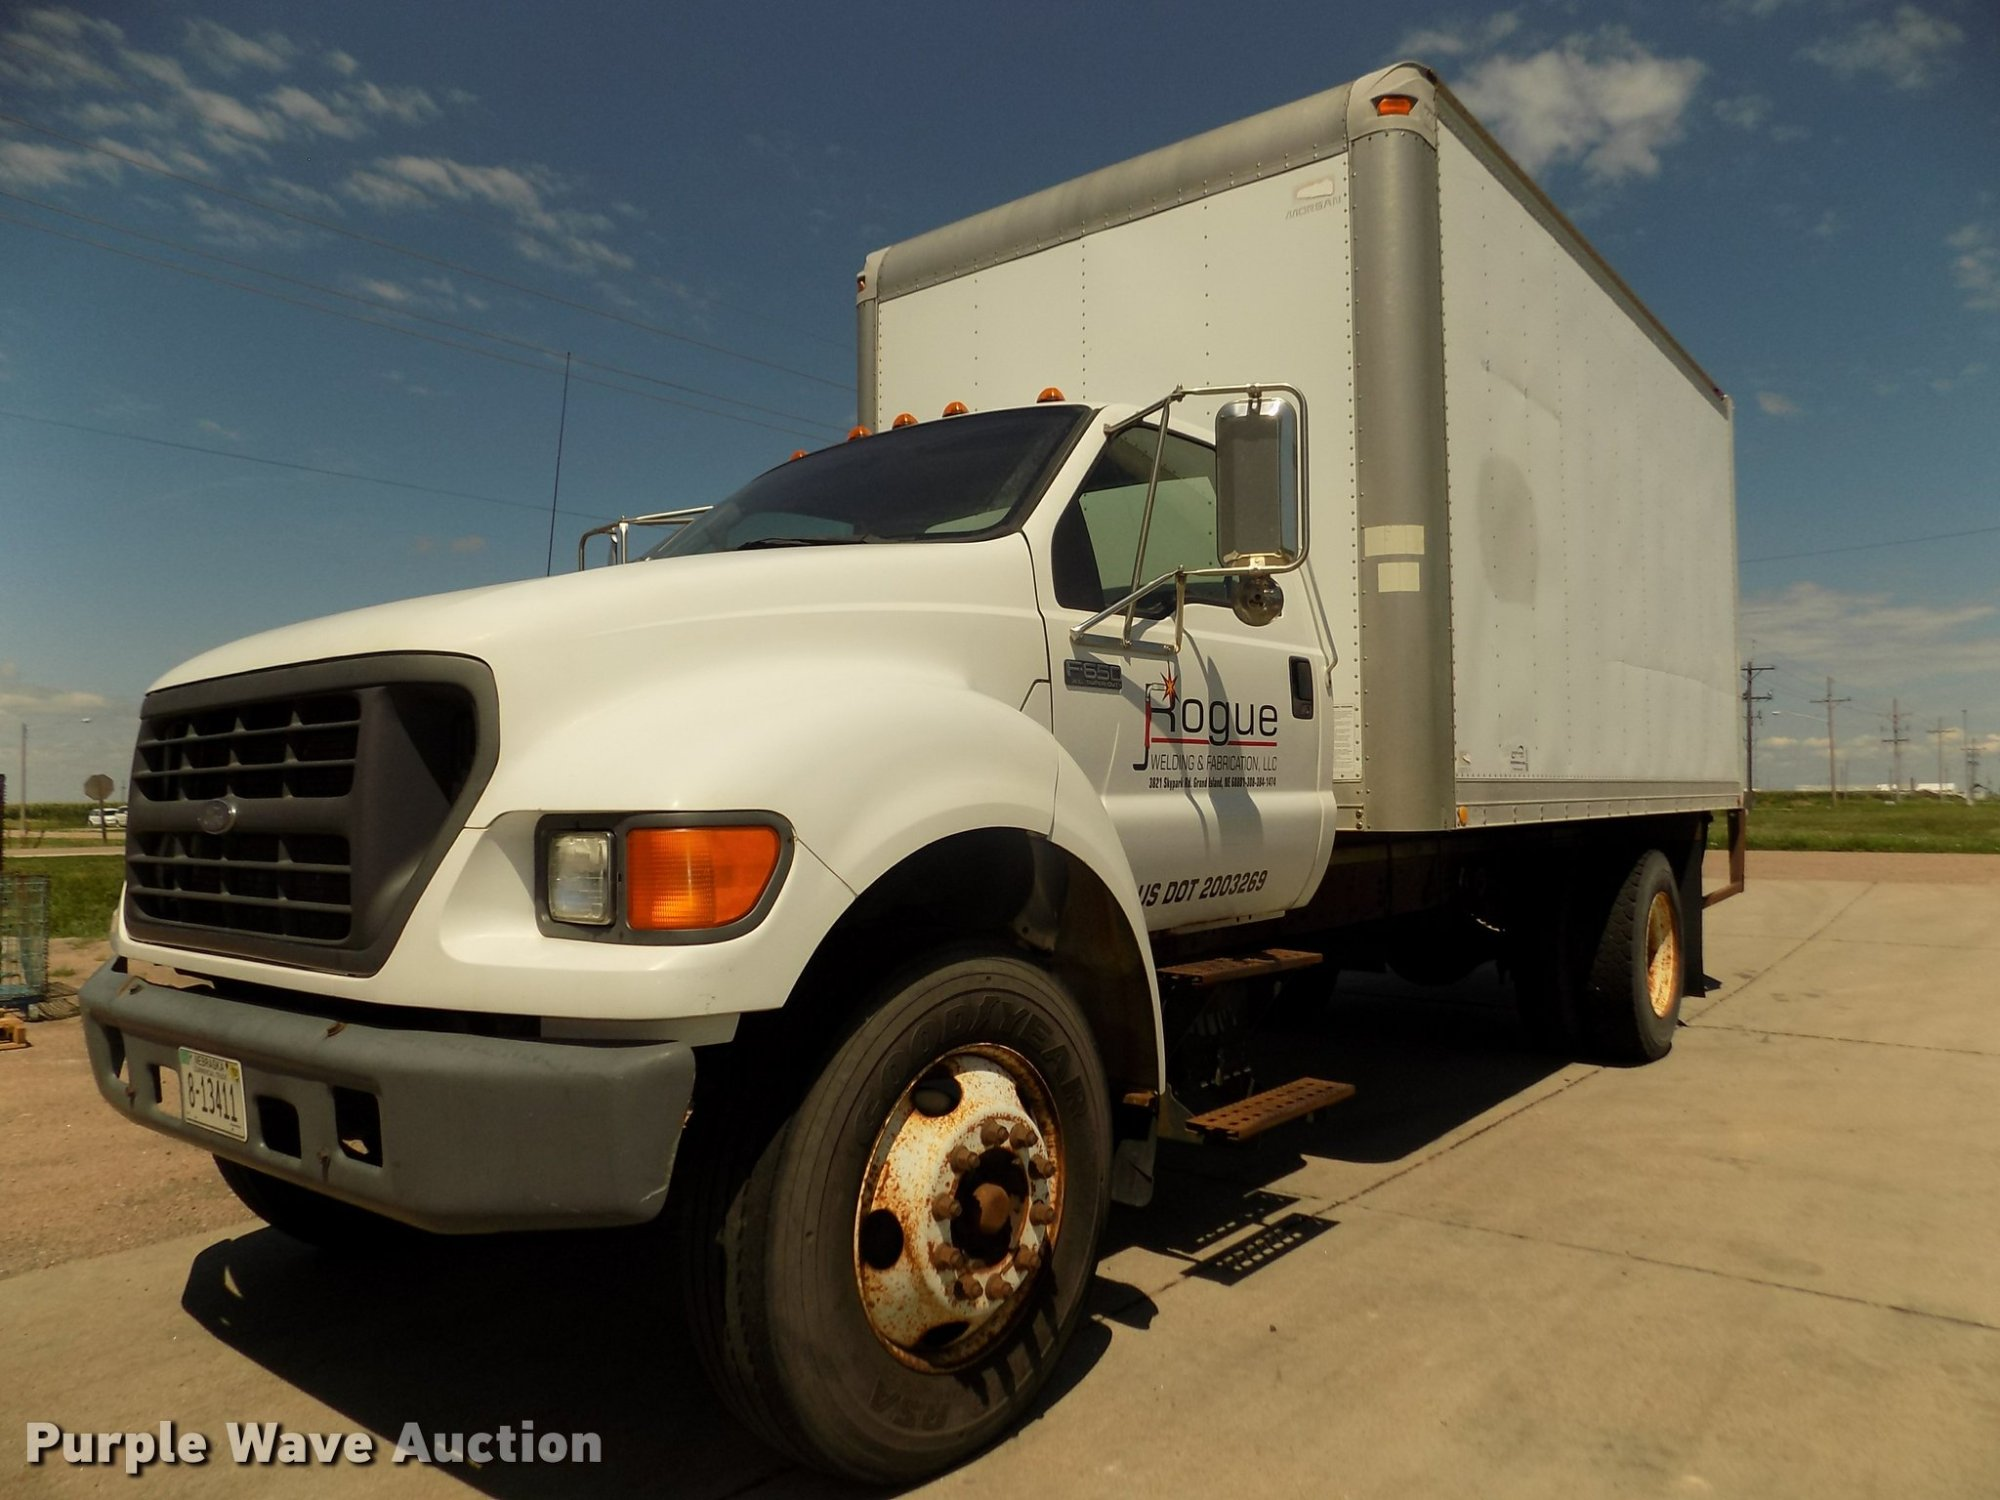 hight resolution of da3067 image for item da3067 2000 ford f650 super duty xl box truck